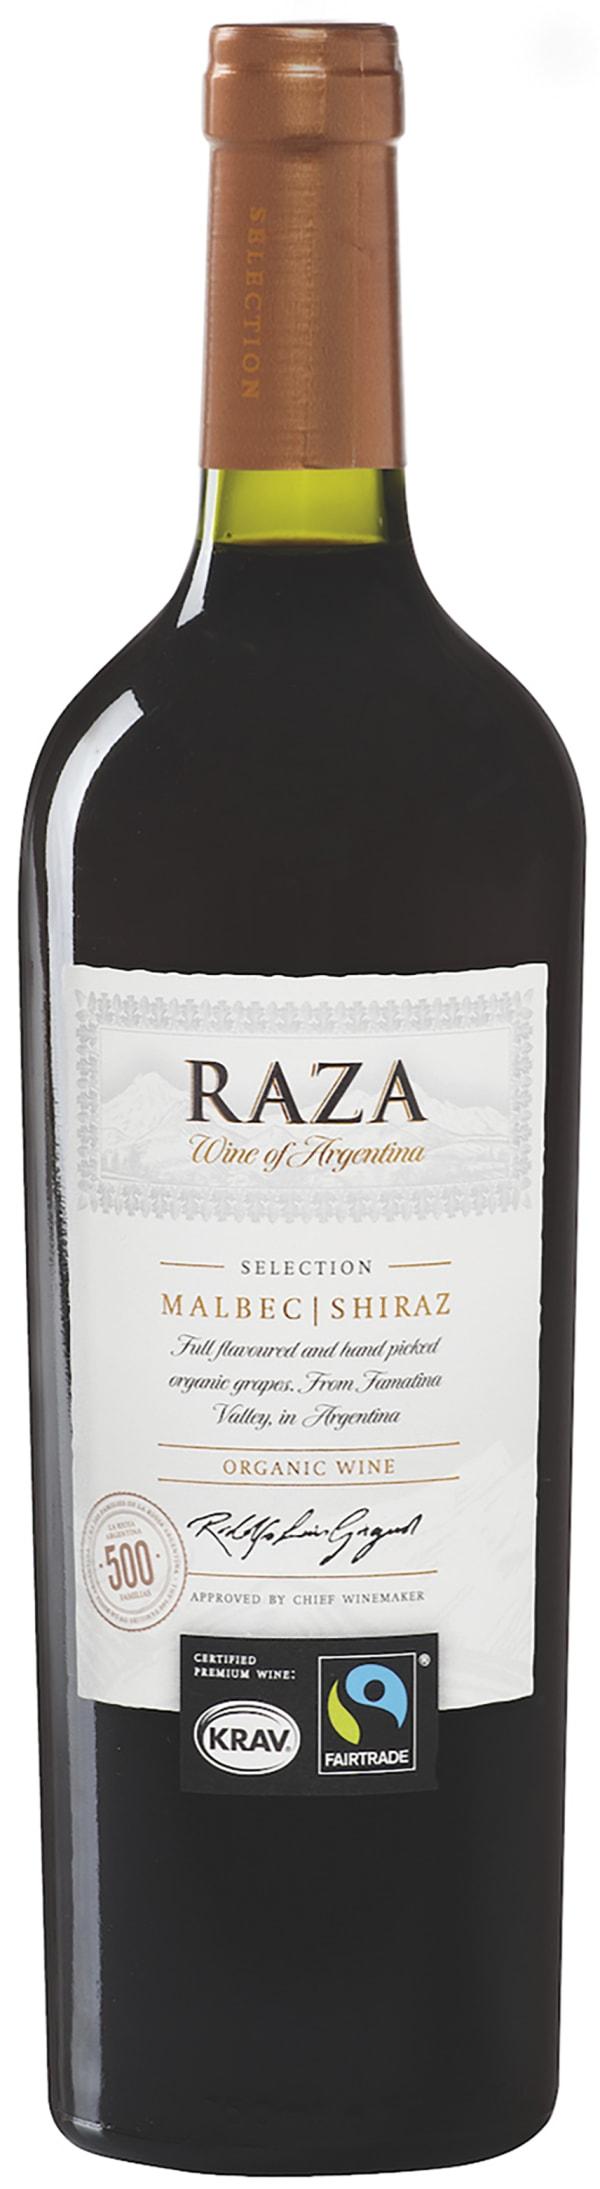 Raza Selection Malbec Shiraz Organic 2014